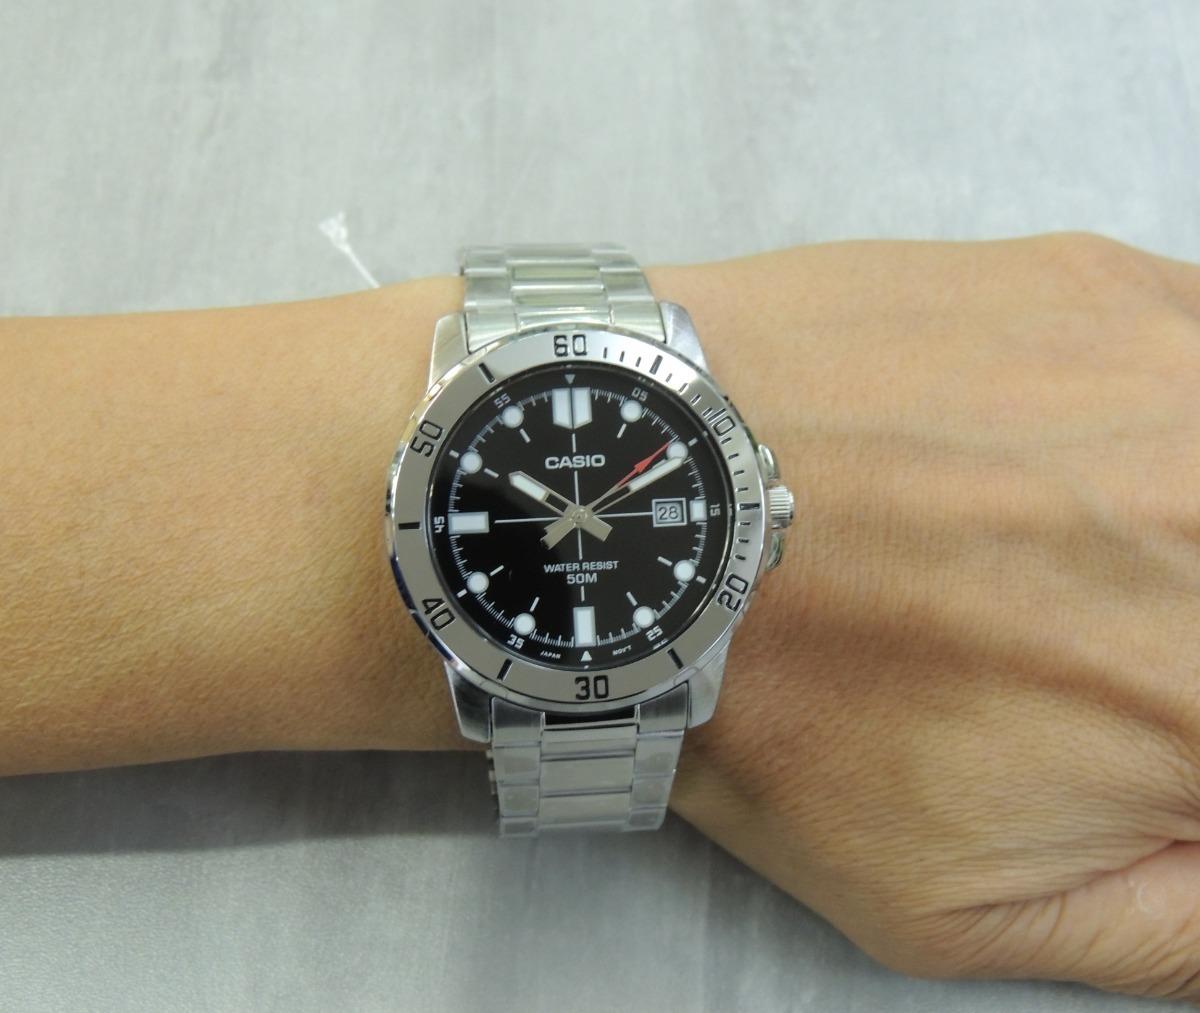 617d51c6c02 relógio masculino casio mtp-vd01d-1evudf - nfe   garantia. Carregando zoom.